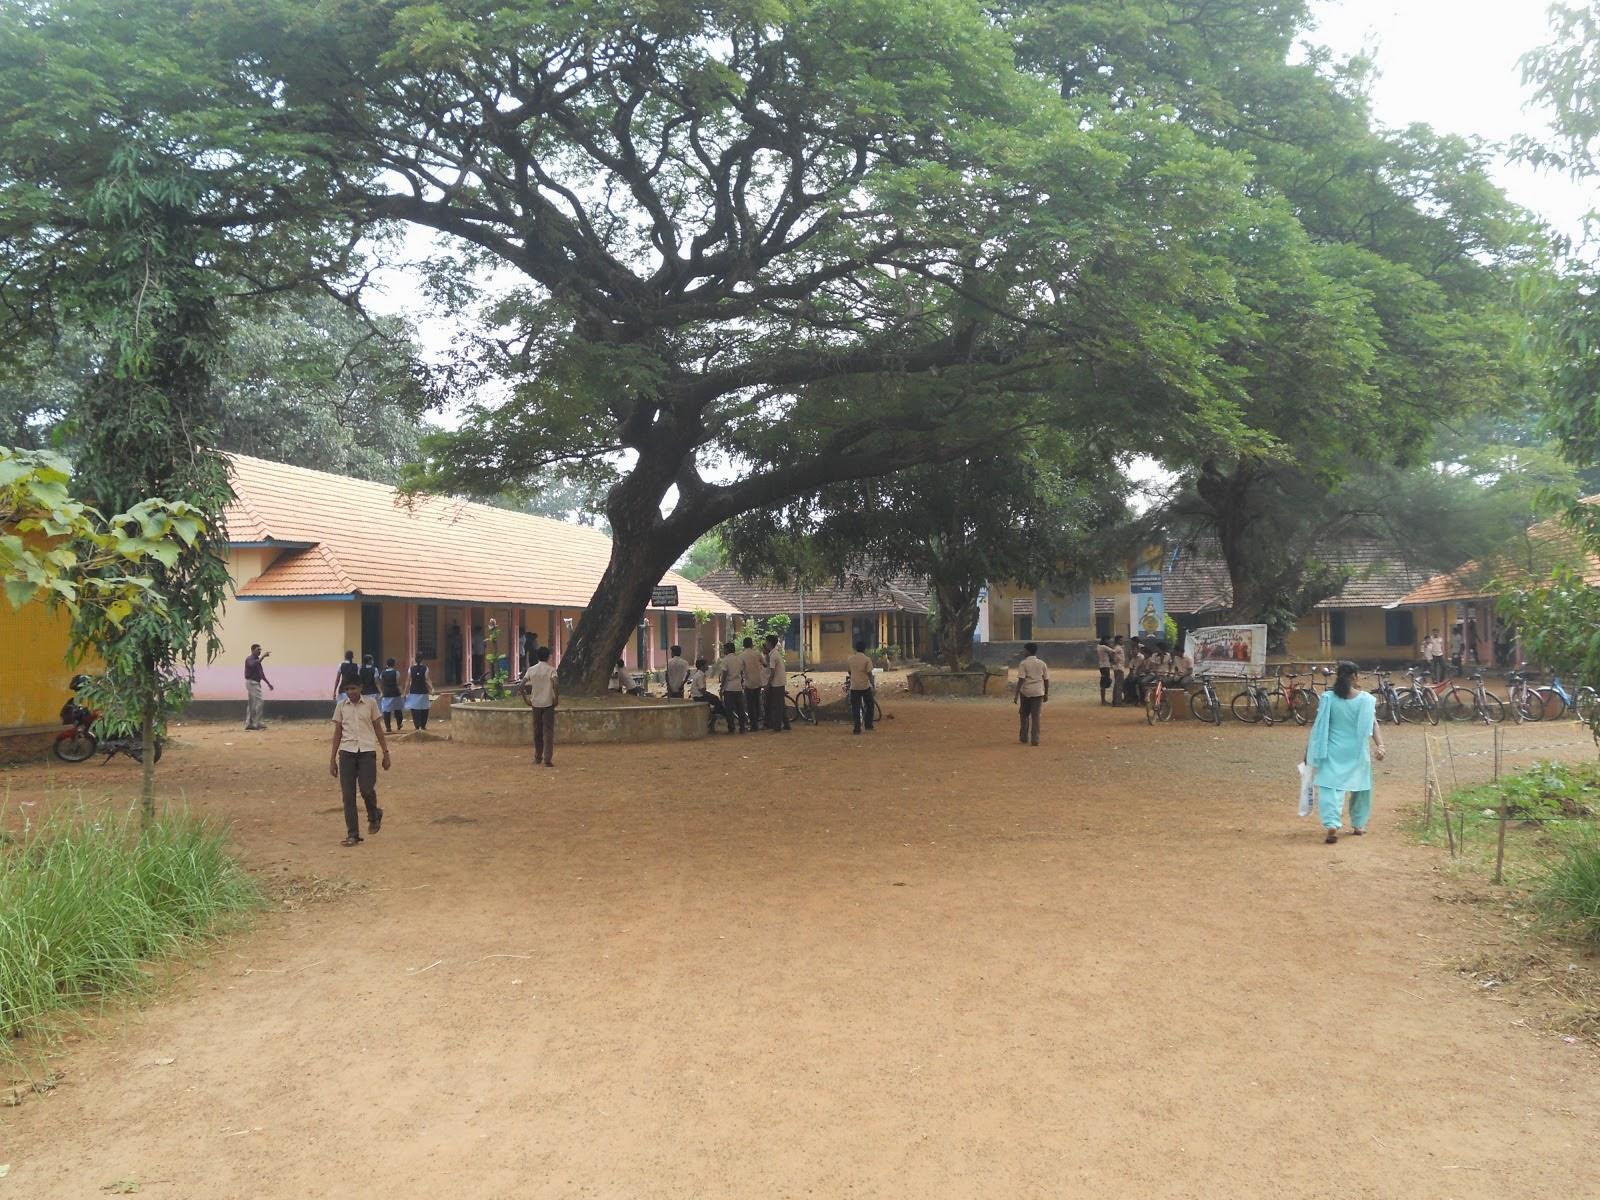 GOVT BOYS SCHOOL CHALAKUDY